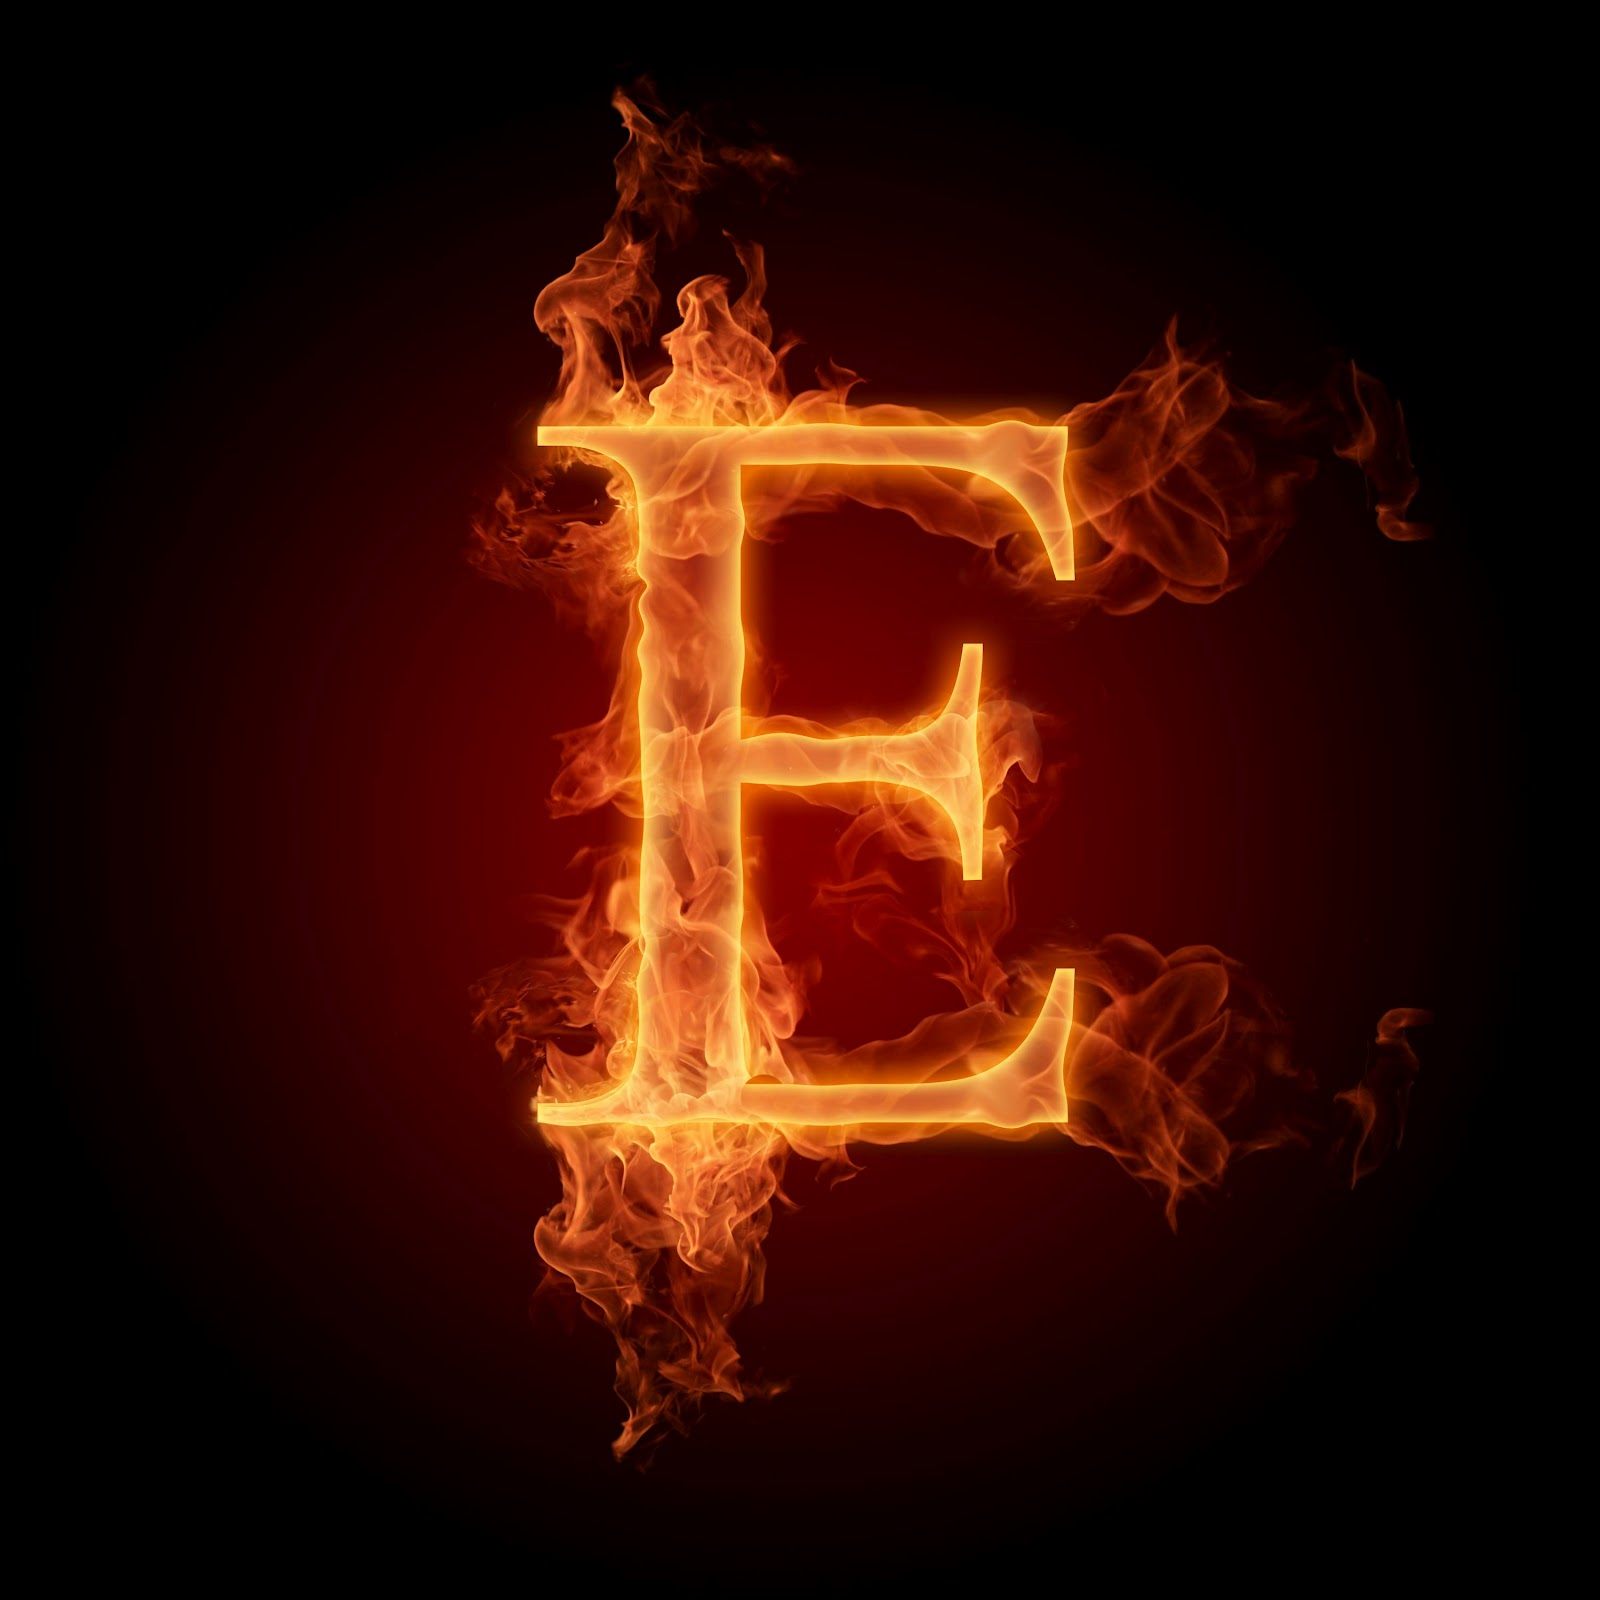 http://1.bp.blogspot.com/-1oyZrSsyvQo/UB0yYAbJnZI/AAAAAAAAAJU/PLzme2m8ULk/s1600/Burning%2BAlphabet%2BWallpaper%2BE.jpg